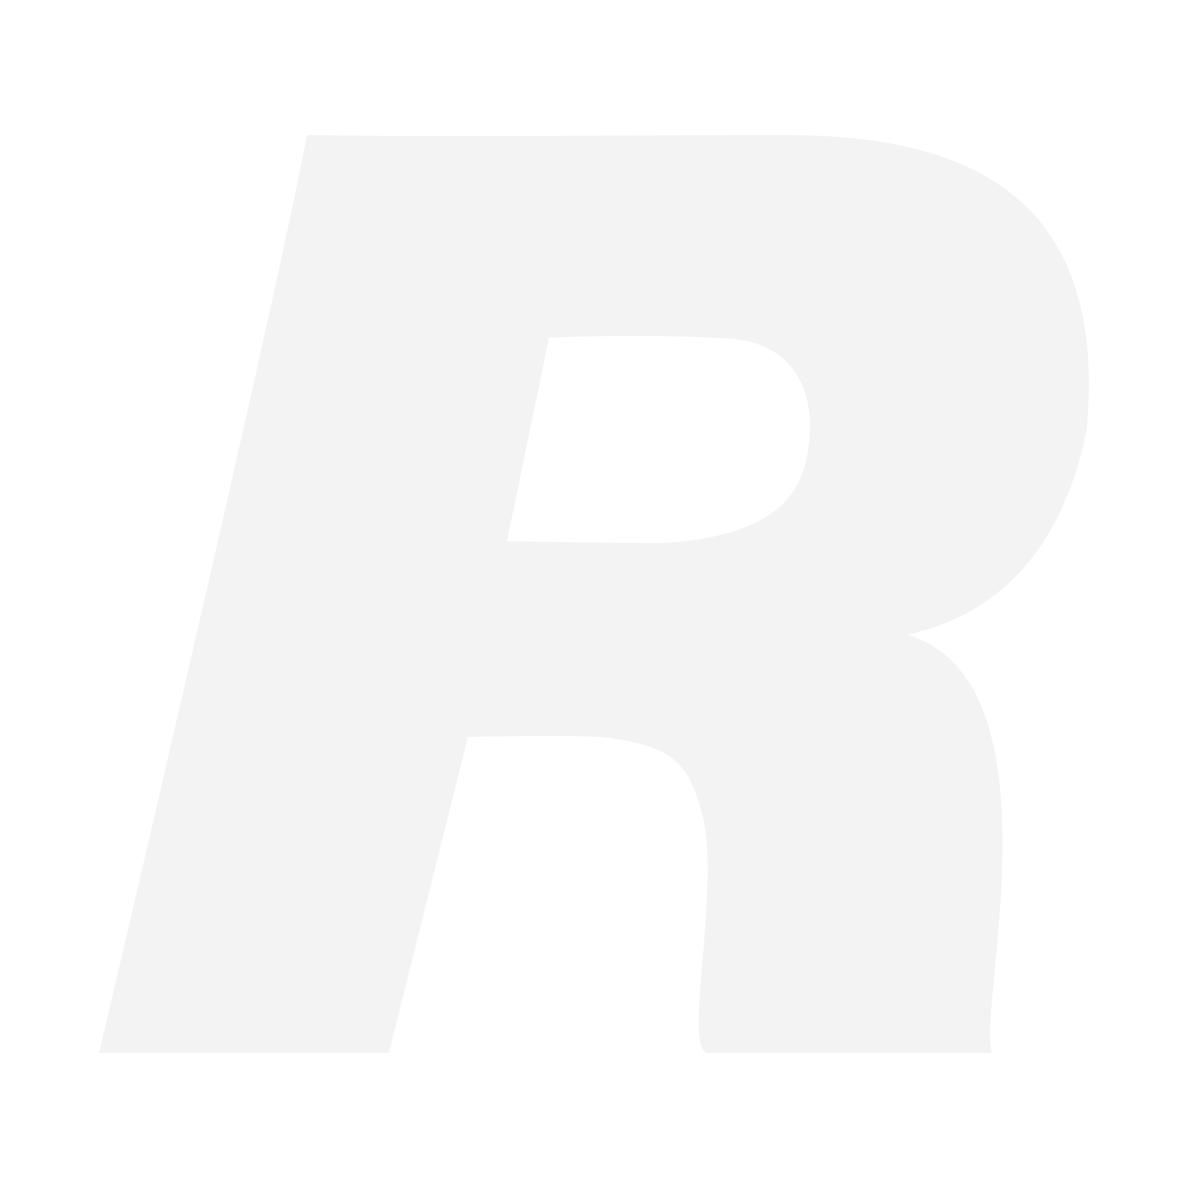 Elinchrom E26110 Rotalux Rotagrid 60x80cm (for E26175)